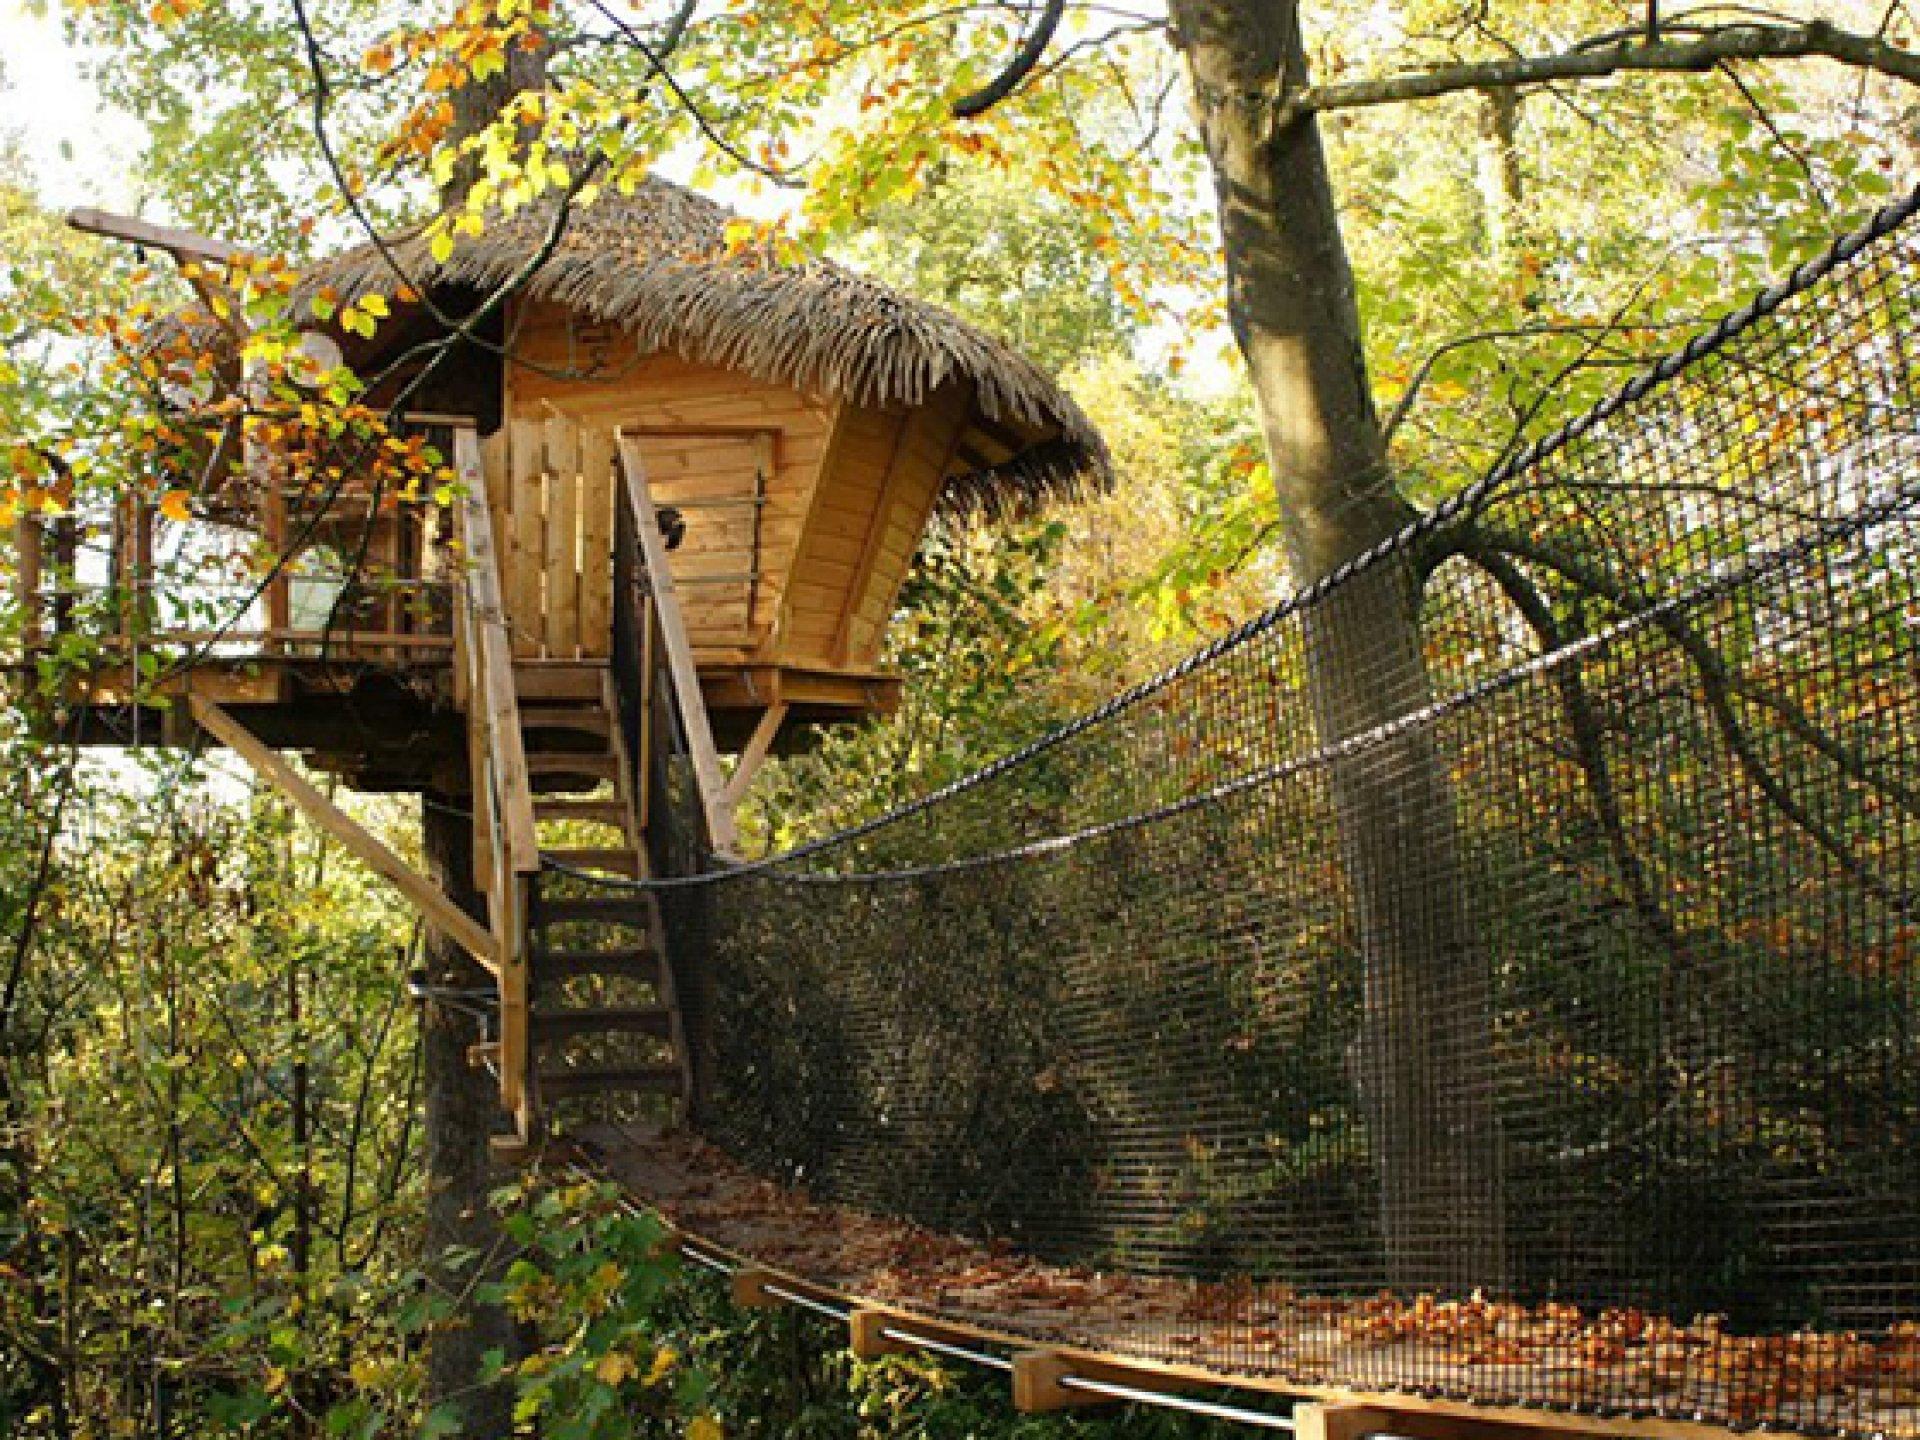 chouette cabane dans les arbres bretagne hebergement insolite dormir bulle. Black Bedroom Furniture Sets. Home Design Ideas